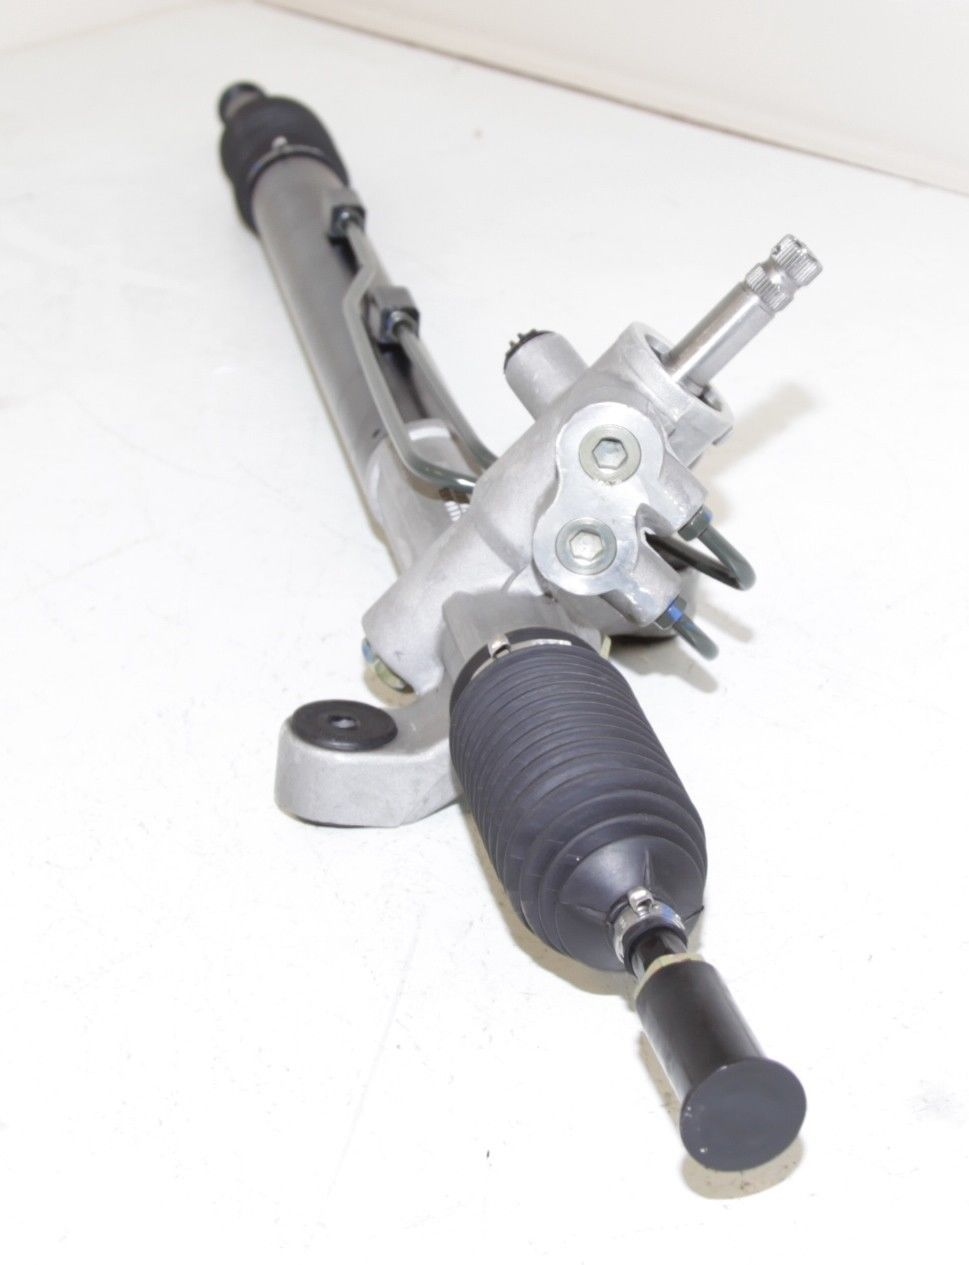 power steering rack pinion gear for 03 07 accord 2 4l non hybrid 4 c 53601 sep a04 53601sdna04 53600 sda a04